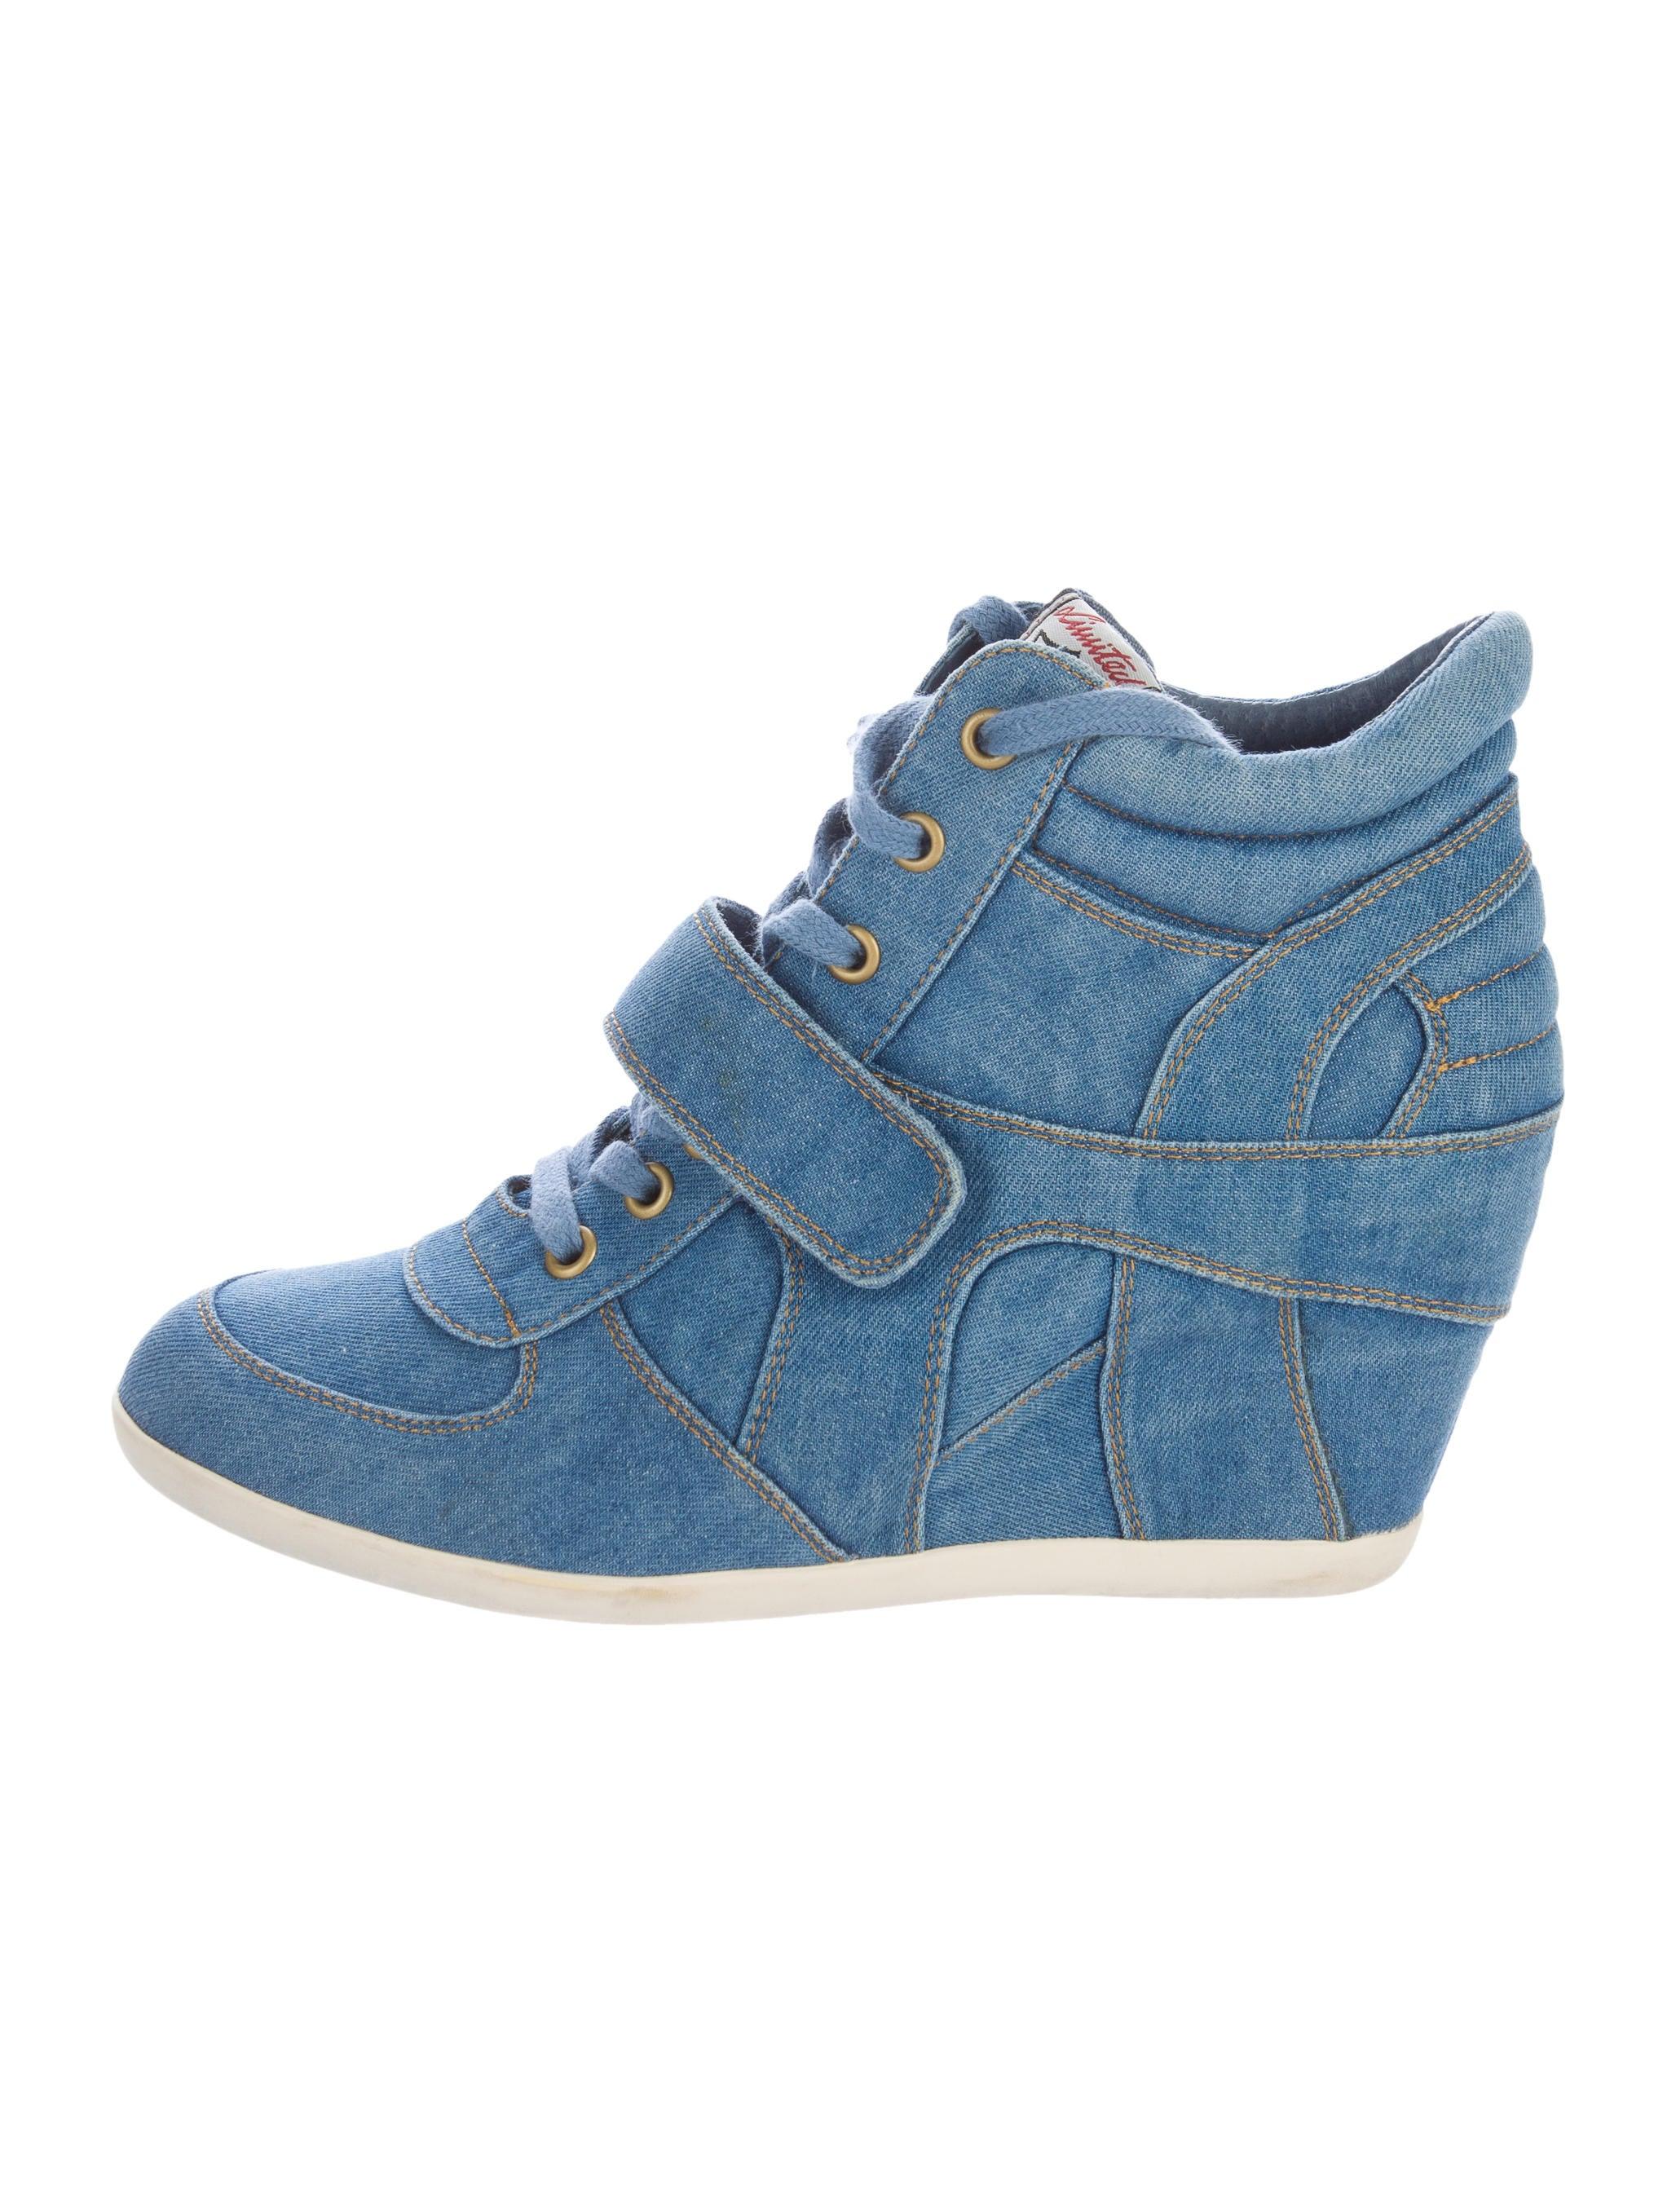 958c4bd6e120a Ash Bowie Wedge Sneakers - Shoes - WAB20218